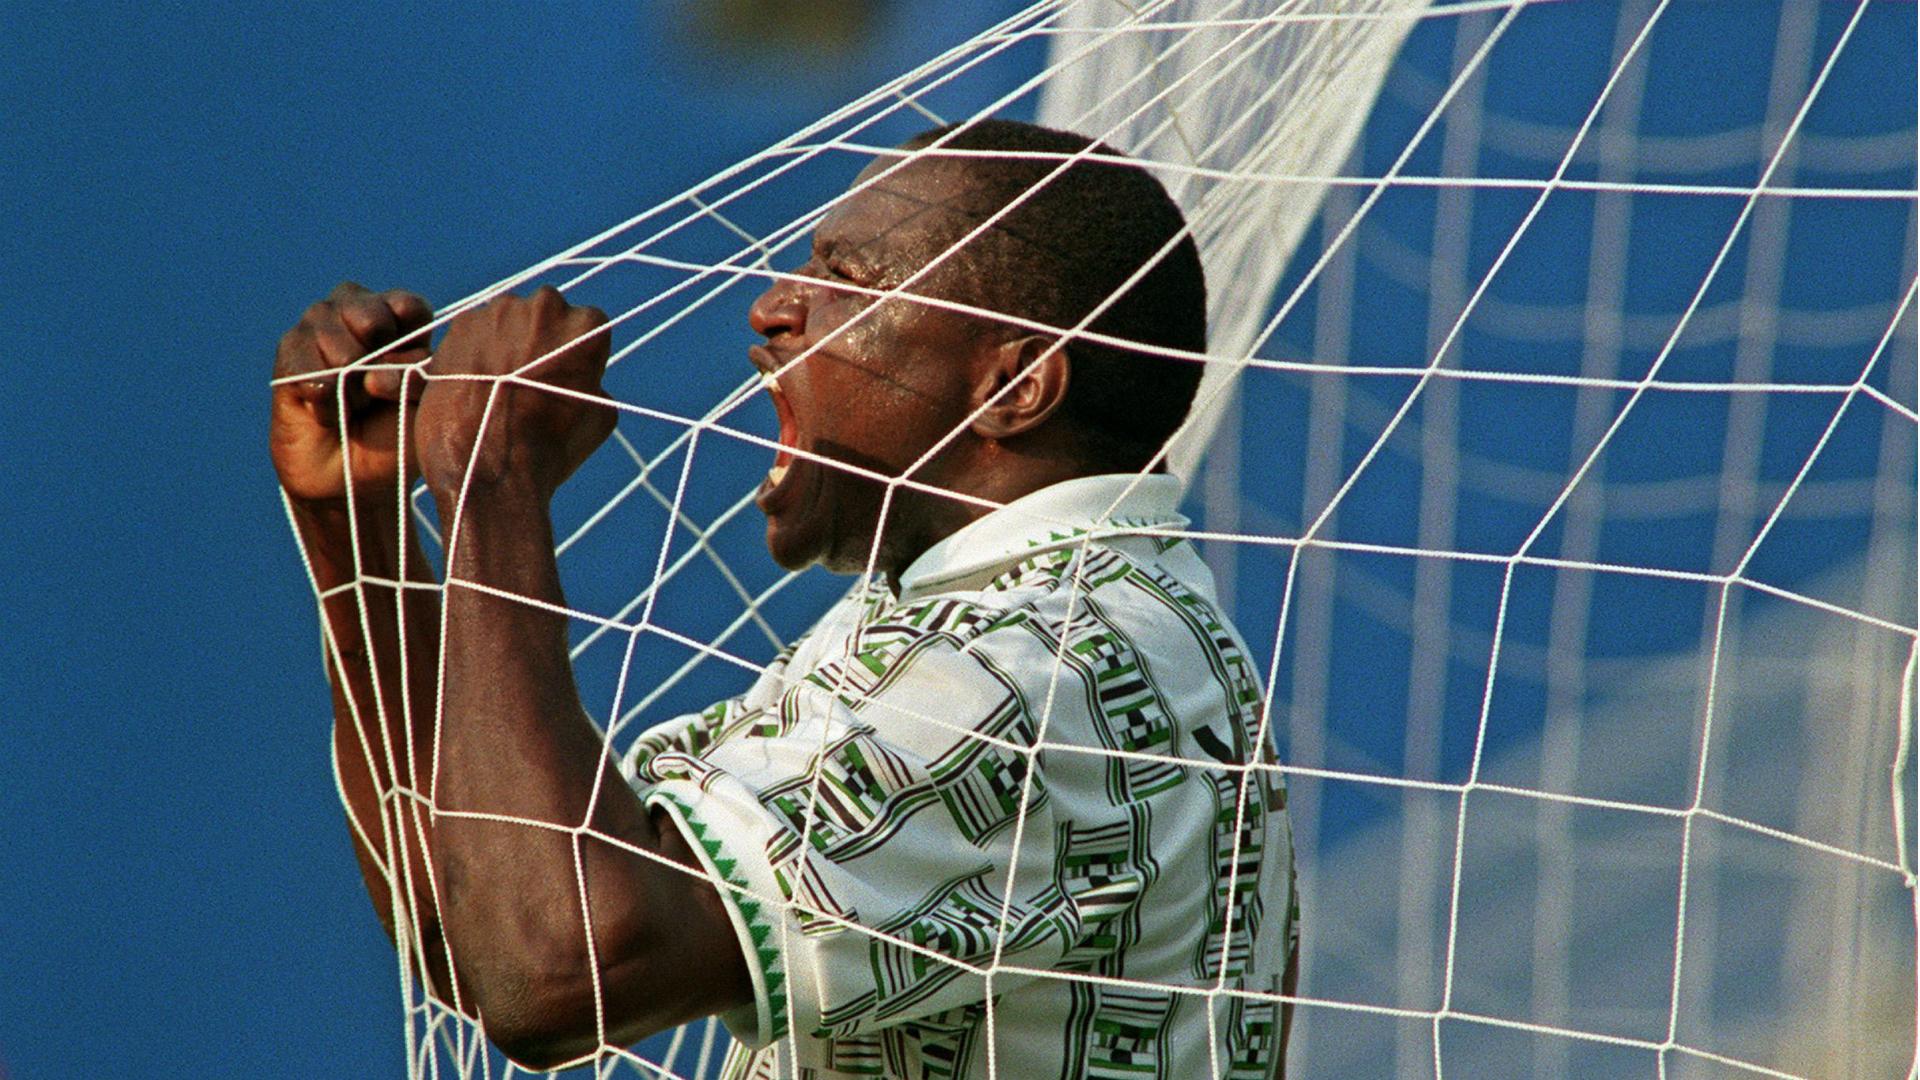 Can Manchester United transfer target Osimhen break Yekini's Nigeria record?